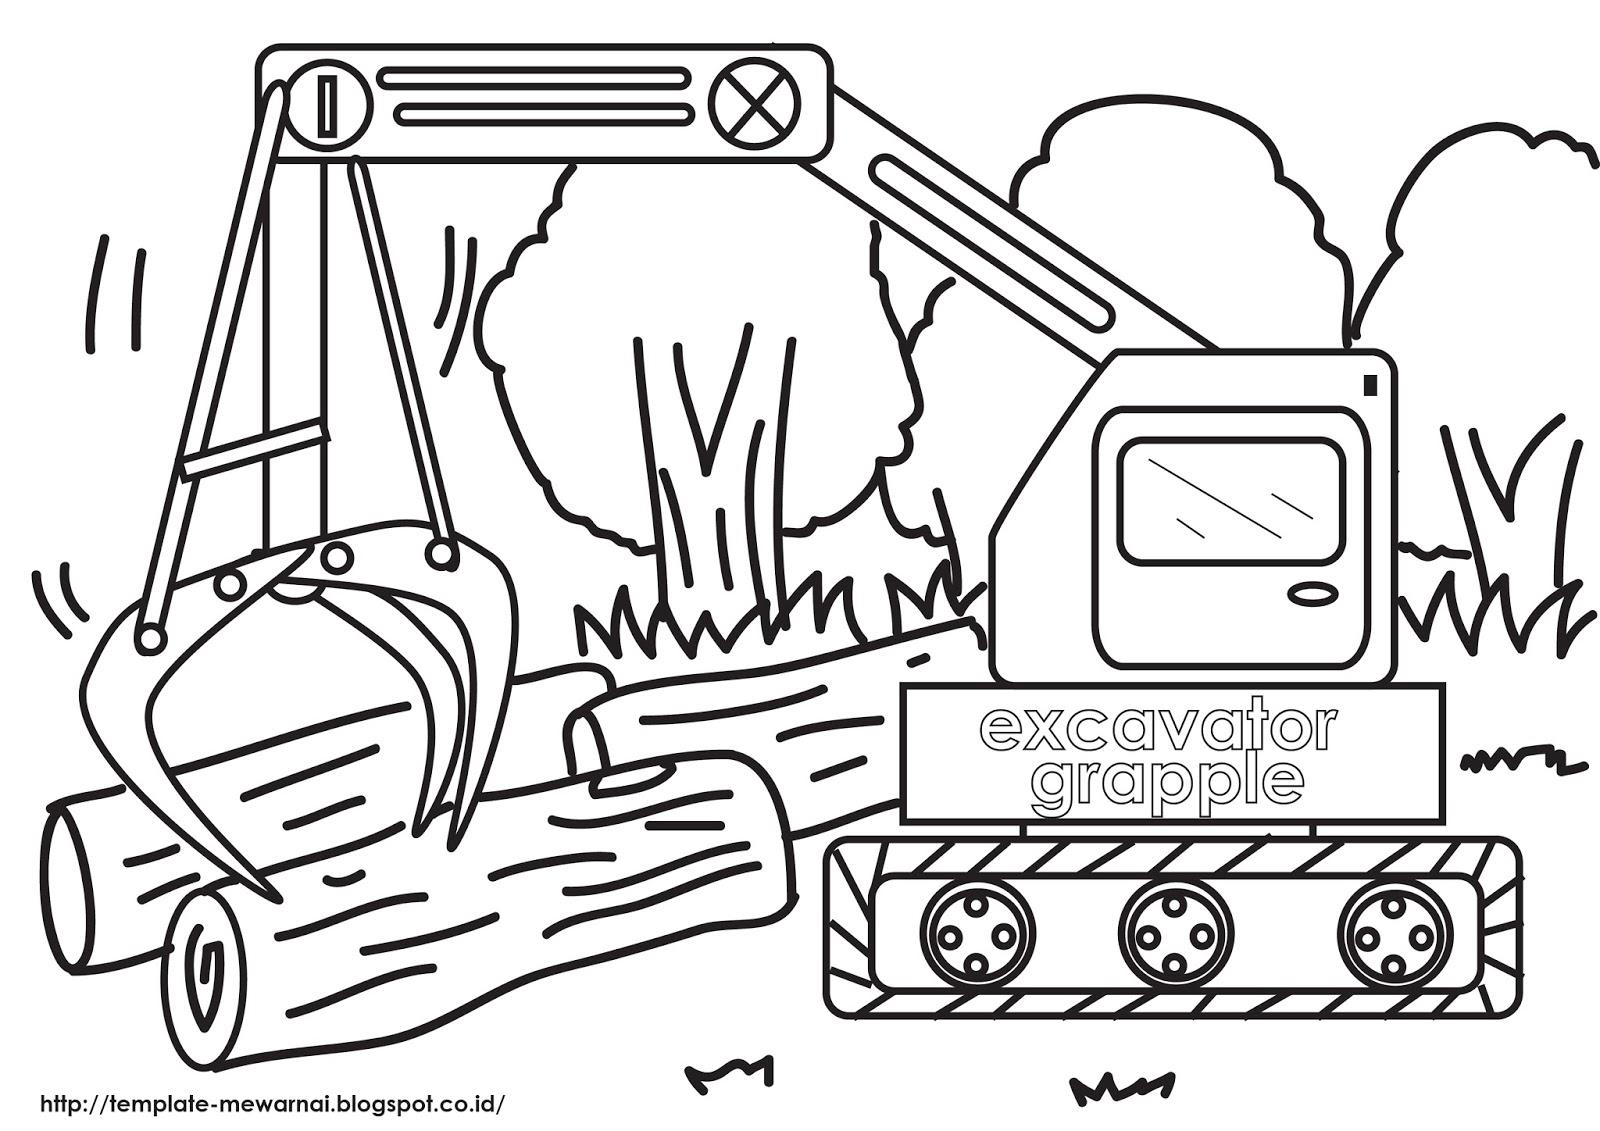 Seri Alat Berat Excavator Grapple